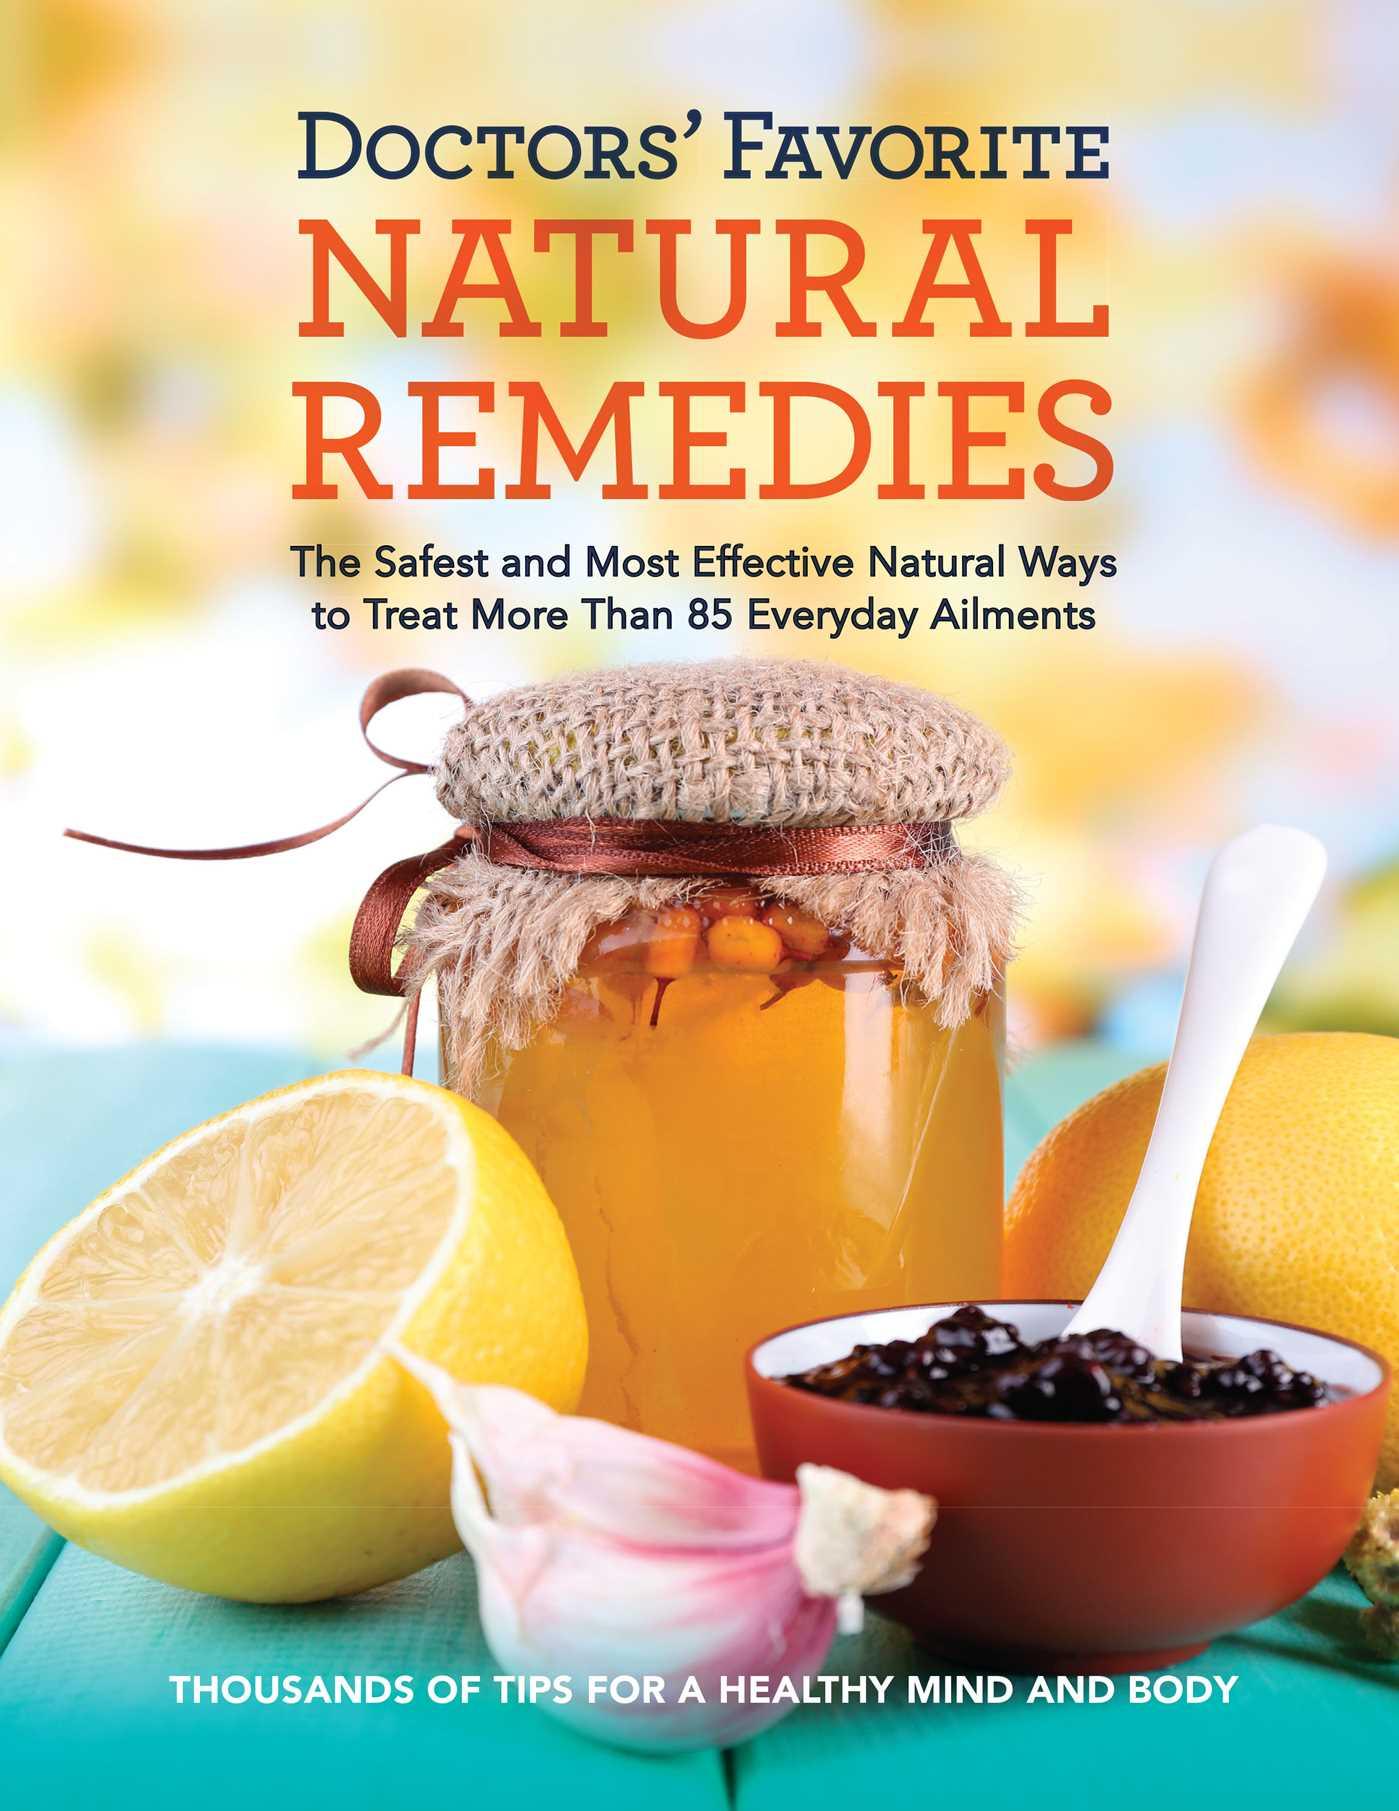 doctorsu0027 favorite natural remedies book by editors at readeru0027sdoctors favorite natural remedies 9781621453192 hr